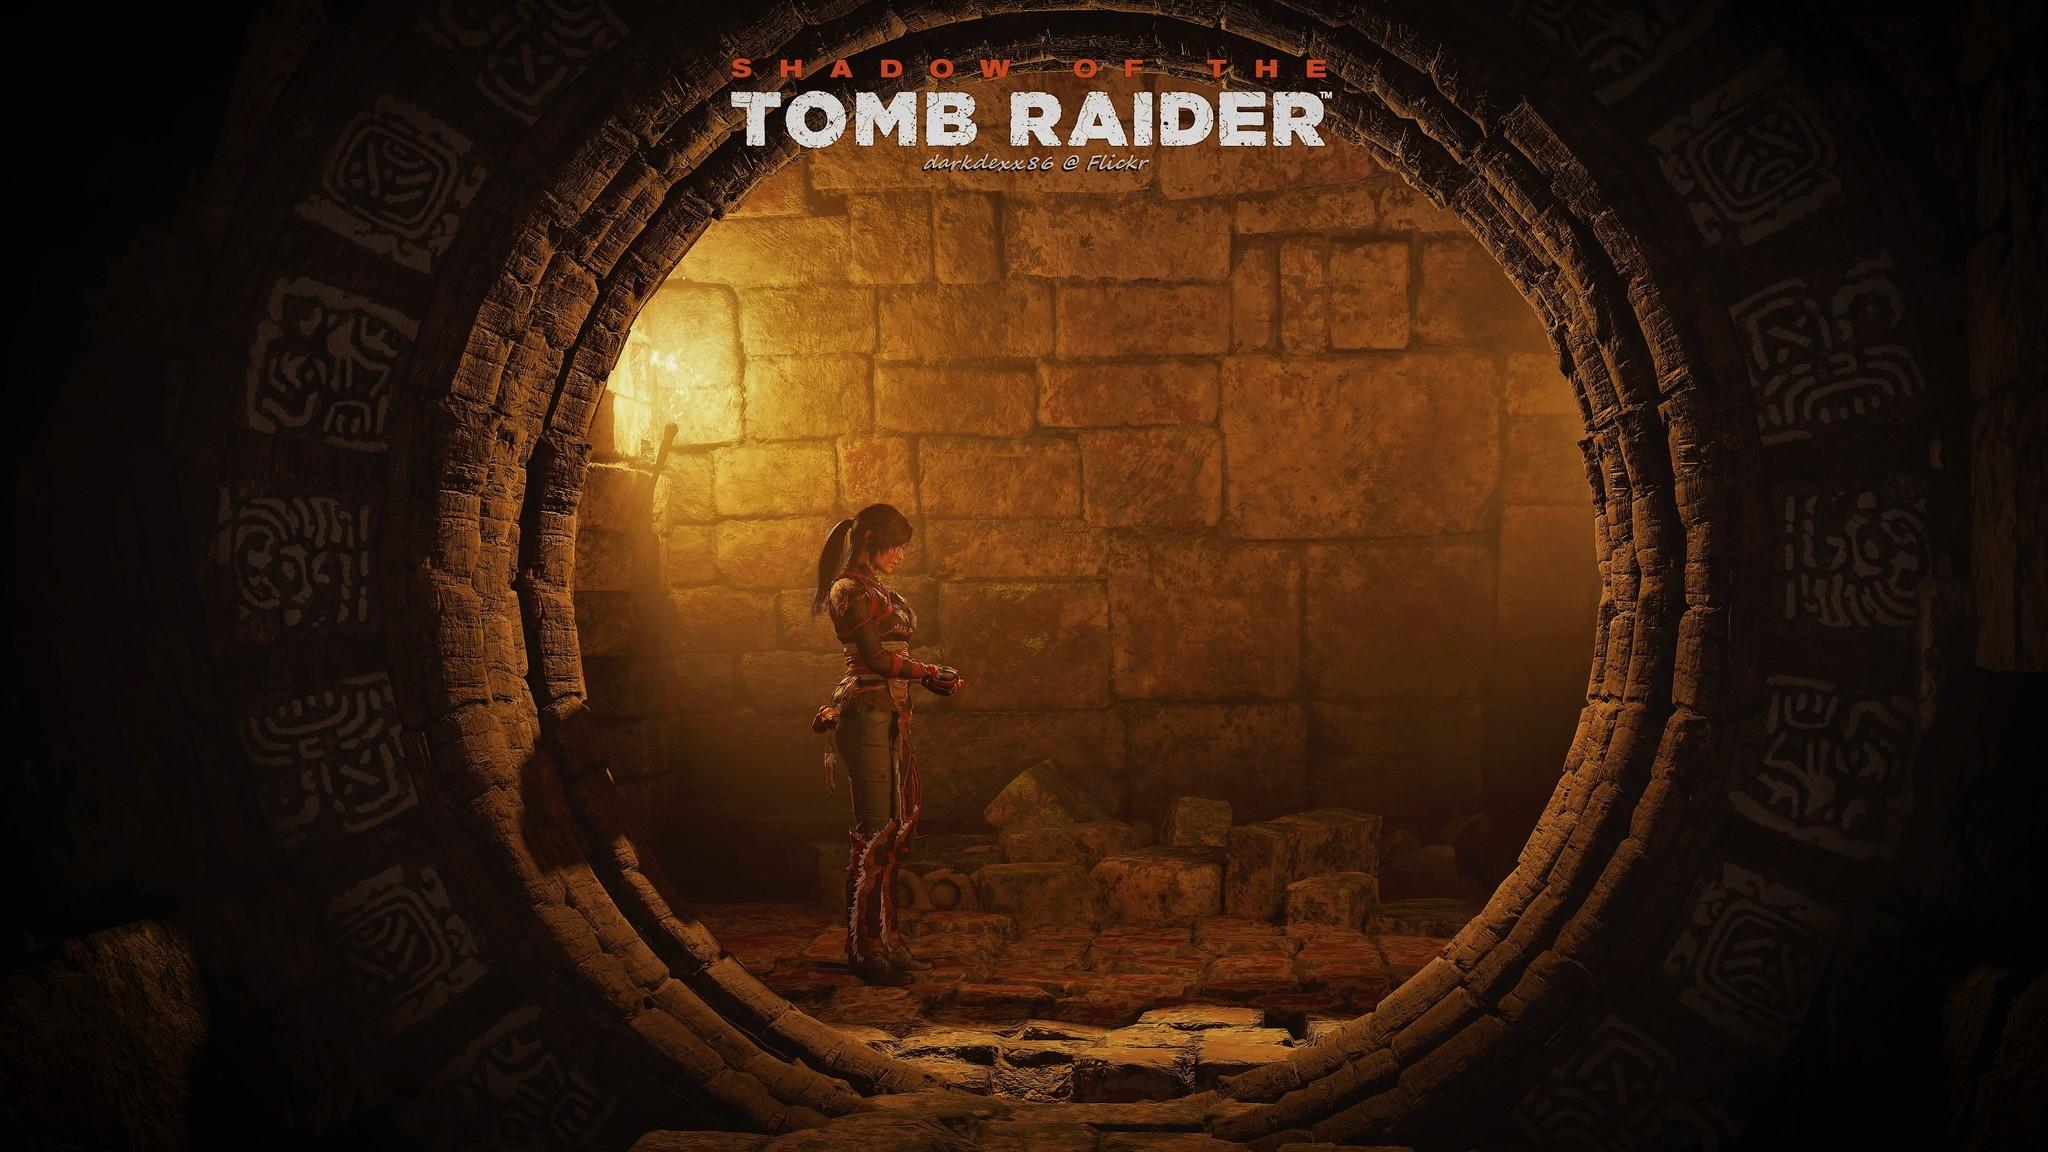 Lara Croft In Shadow Of The Tomb Raider Wallpaper, HD ...